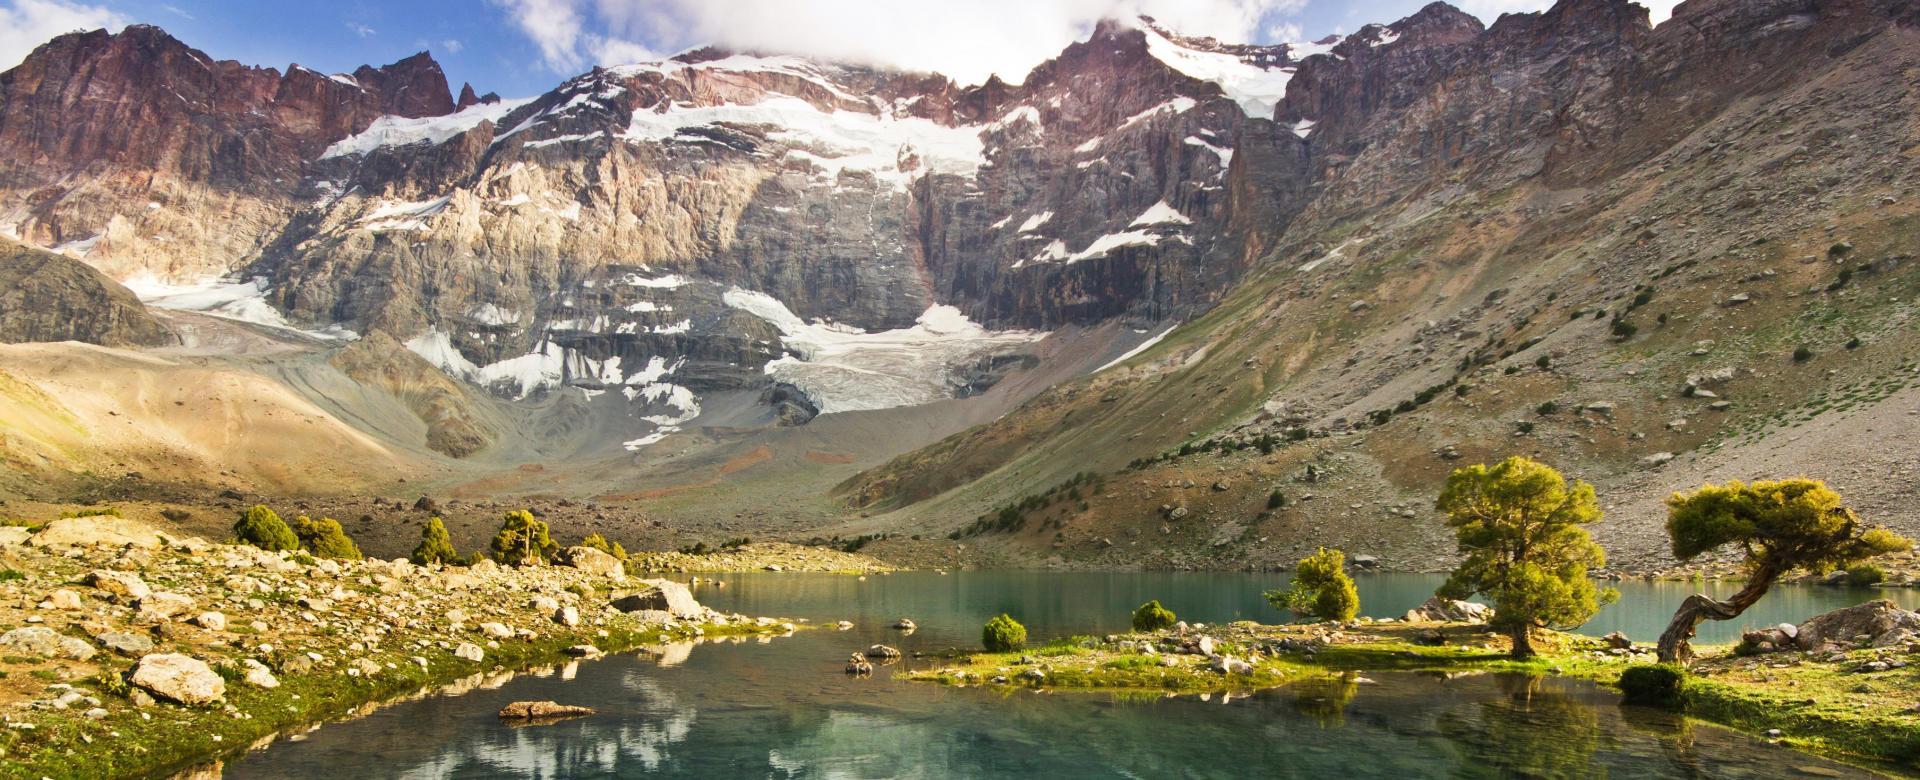 Voyage à pied Tadjikistan : Monts fanskye, boukhara et samarcande